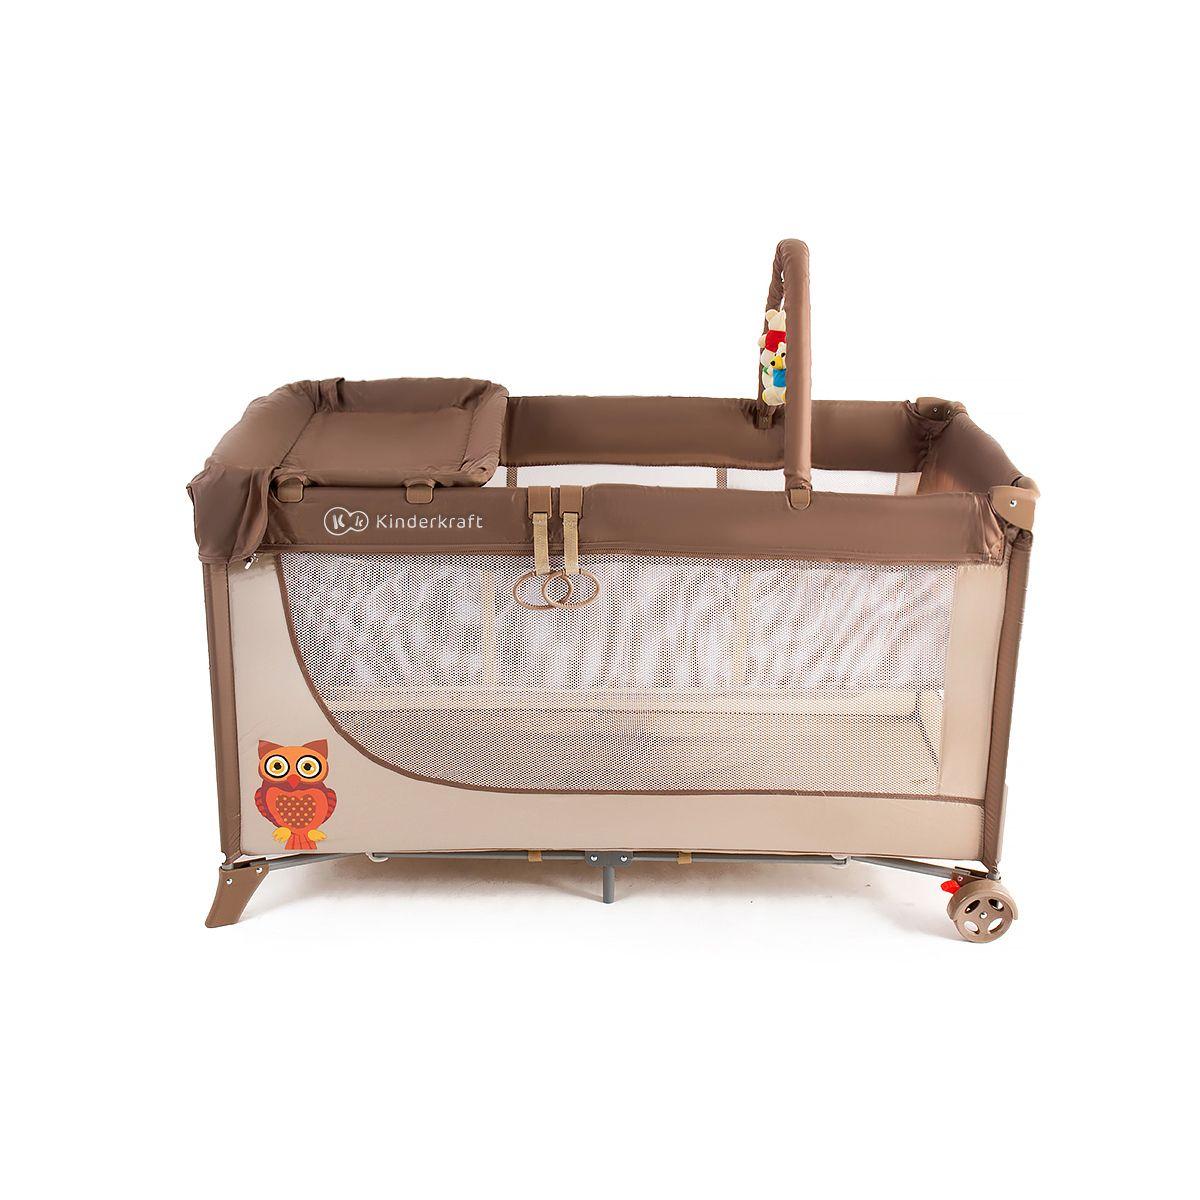 babybett kinder baby reisebett kinderbett klappbett laufstall bett joy plus neu ebay. Black Bedroom Furniture Sets. Home Design Ideas